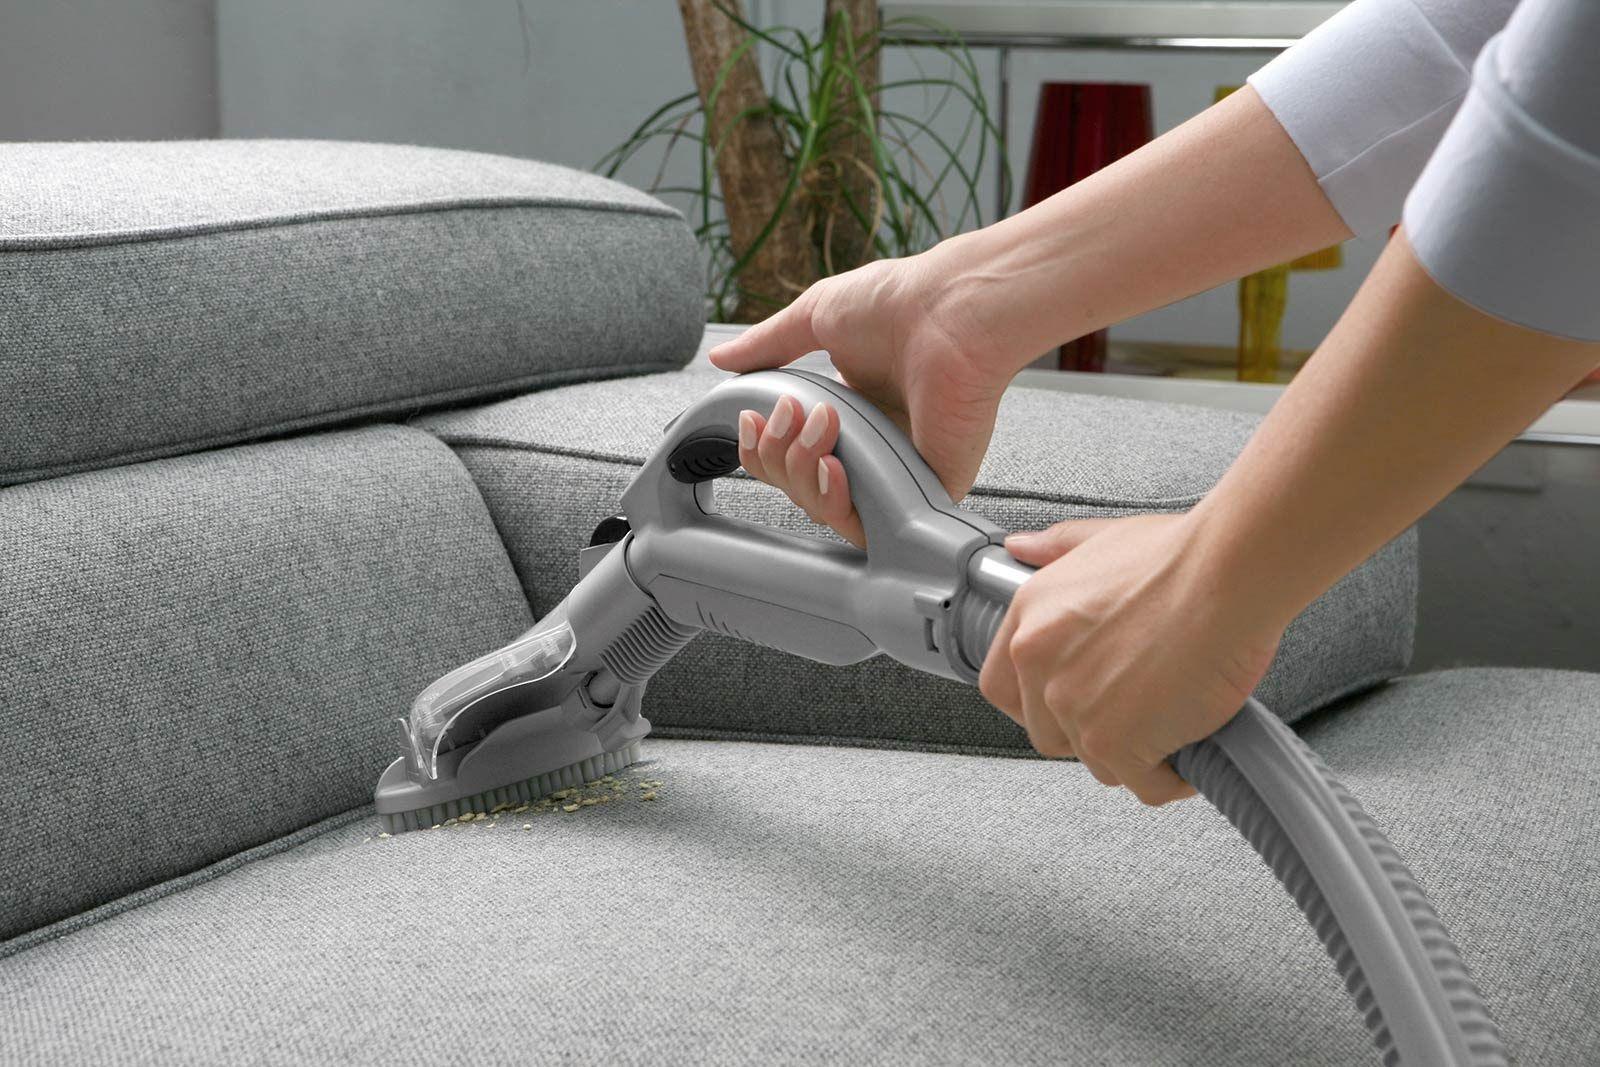 شركه تنظيف مجالس بالرياض 0559229427 رخيصه ومجربه Cleaning Upholstery Clean Sofa Sofa Cleaning Services